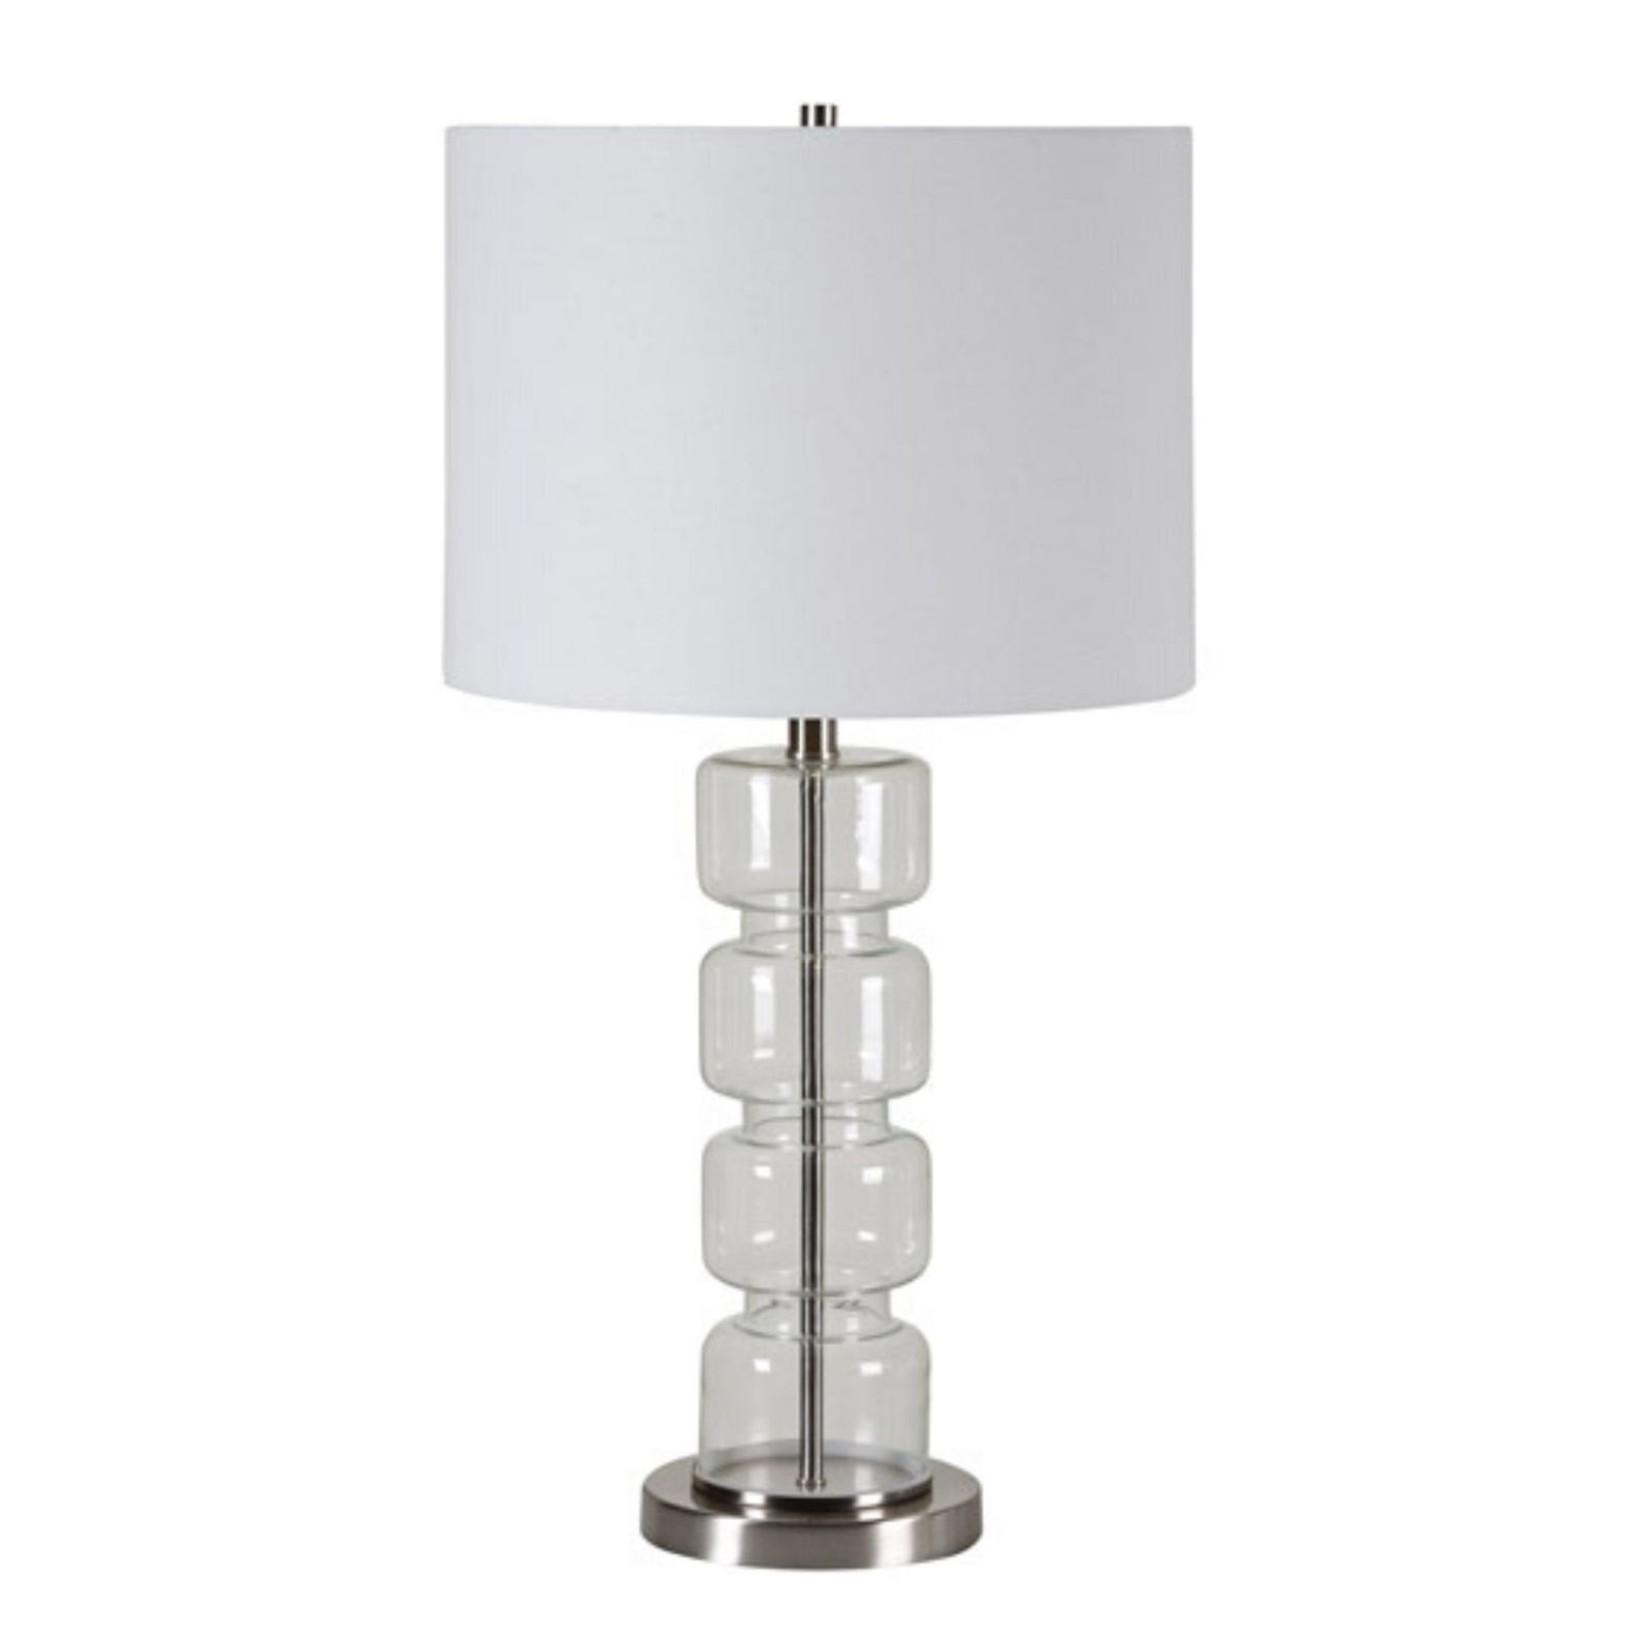 Fernley Table Lamp